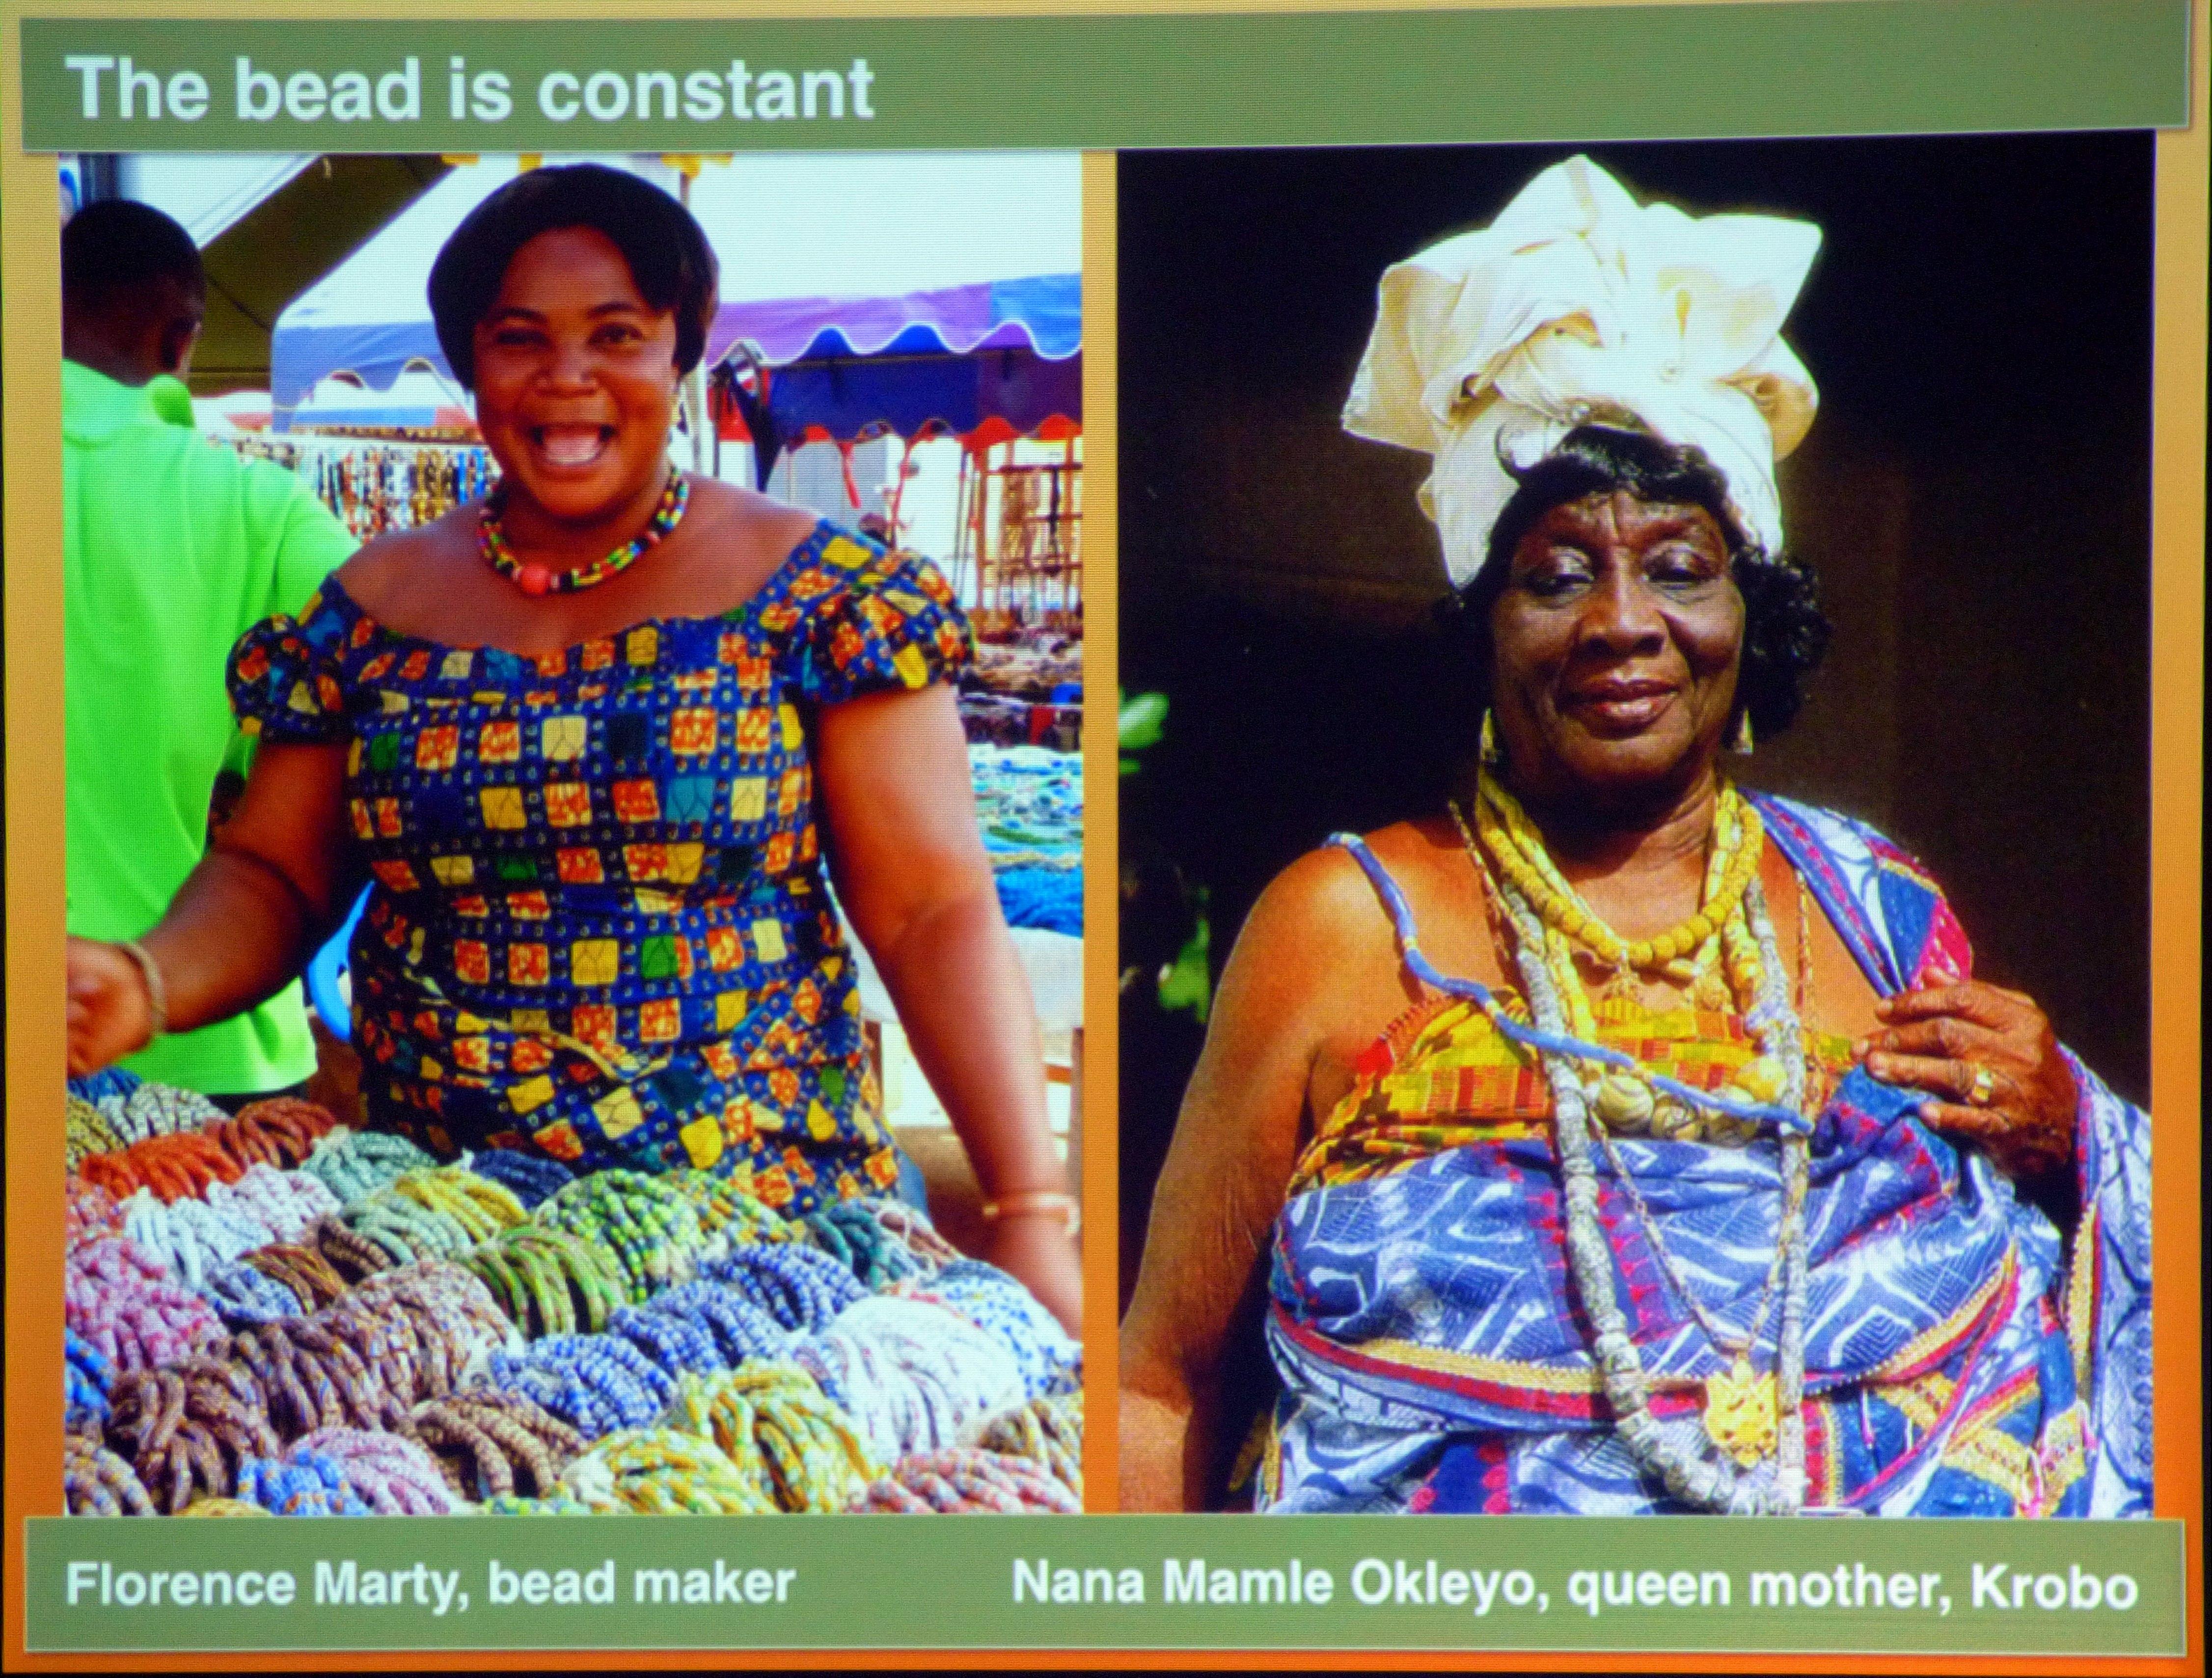 slide by Bob Irwin, Beauty and the Bead Talk 2019